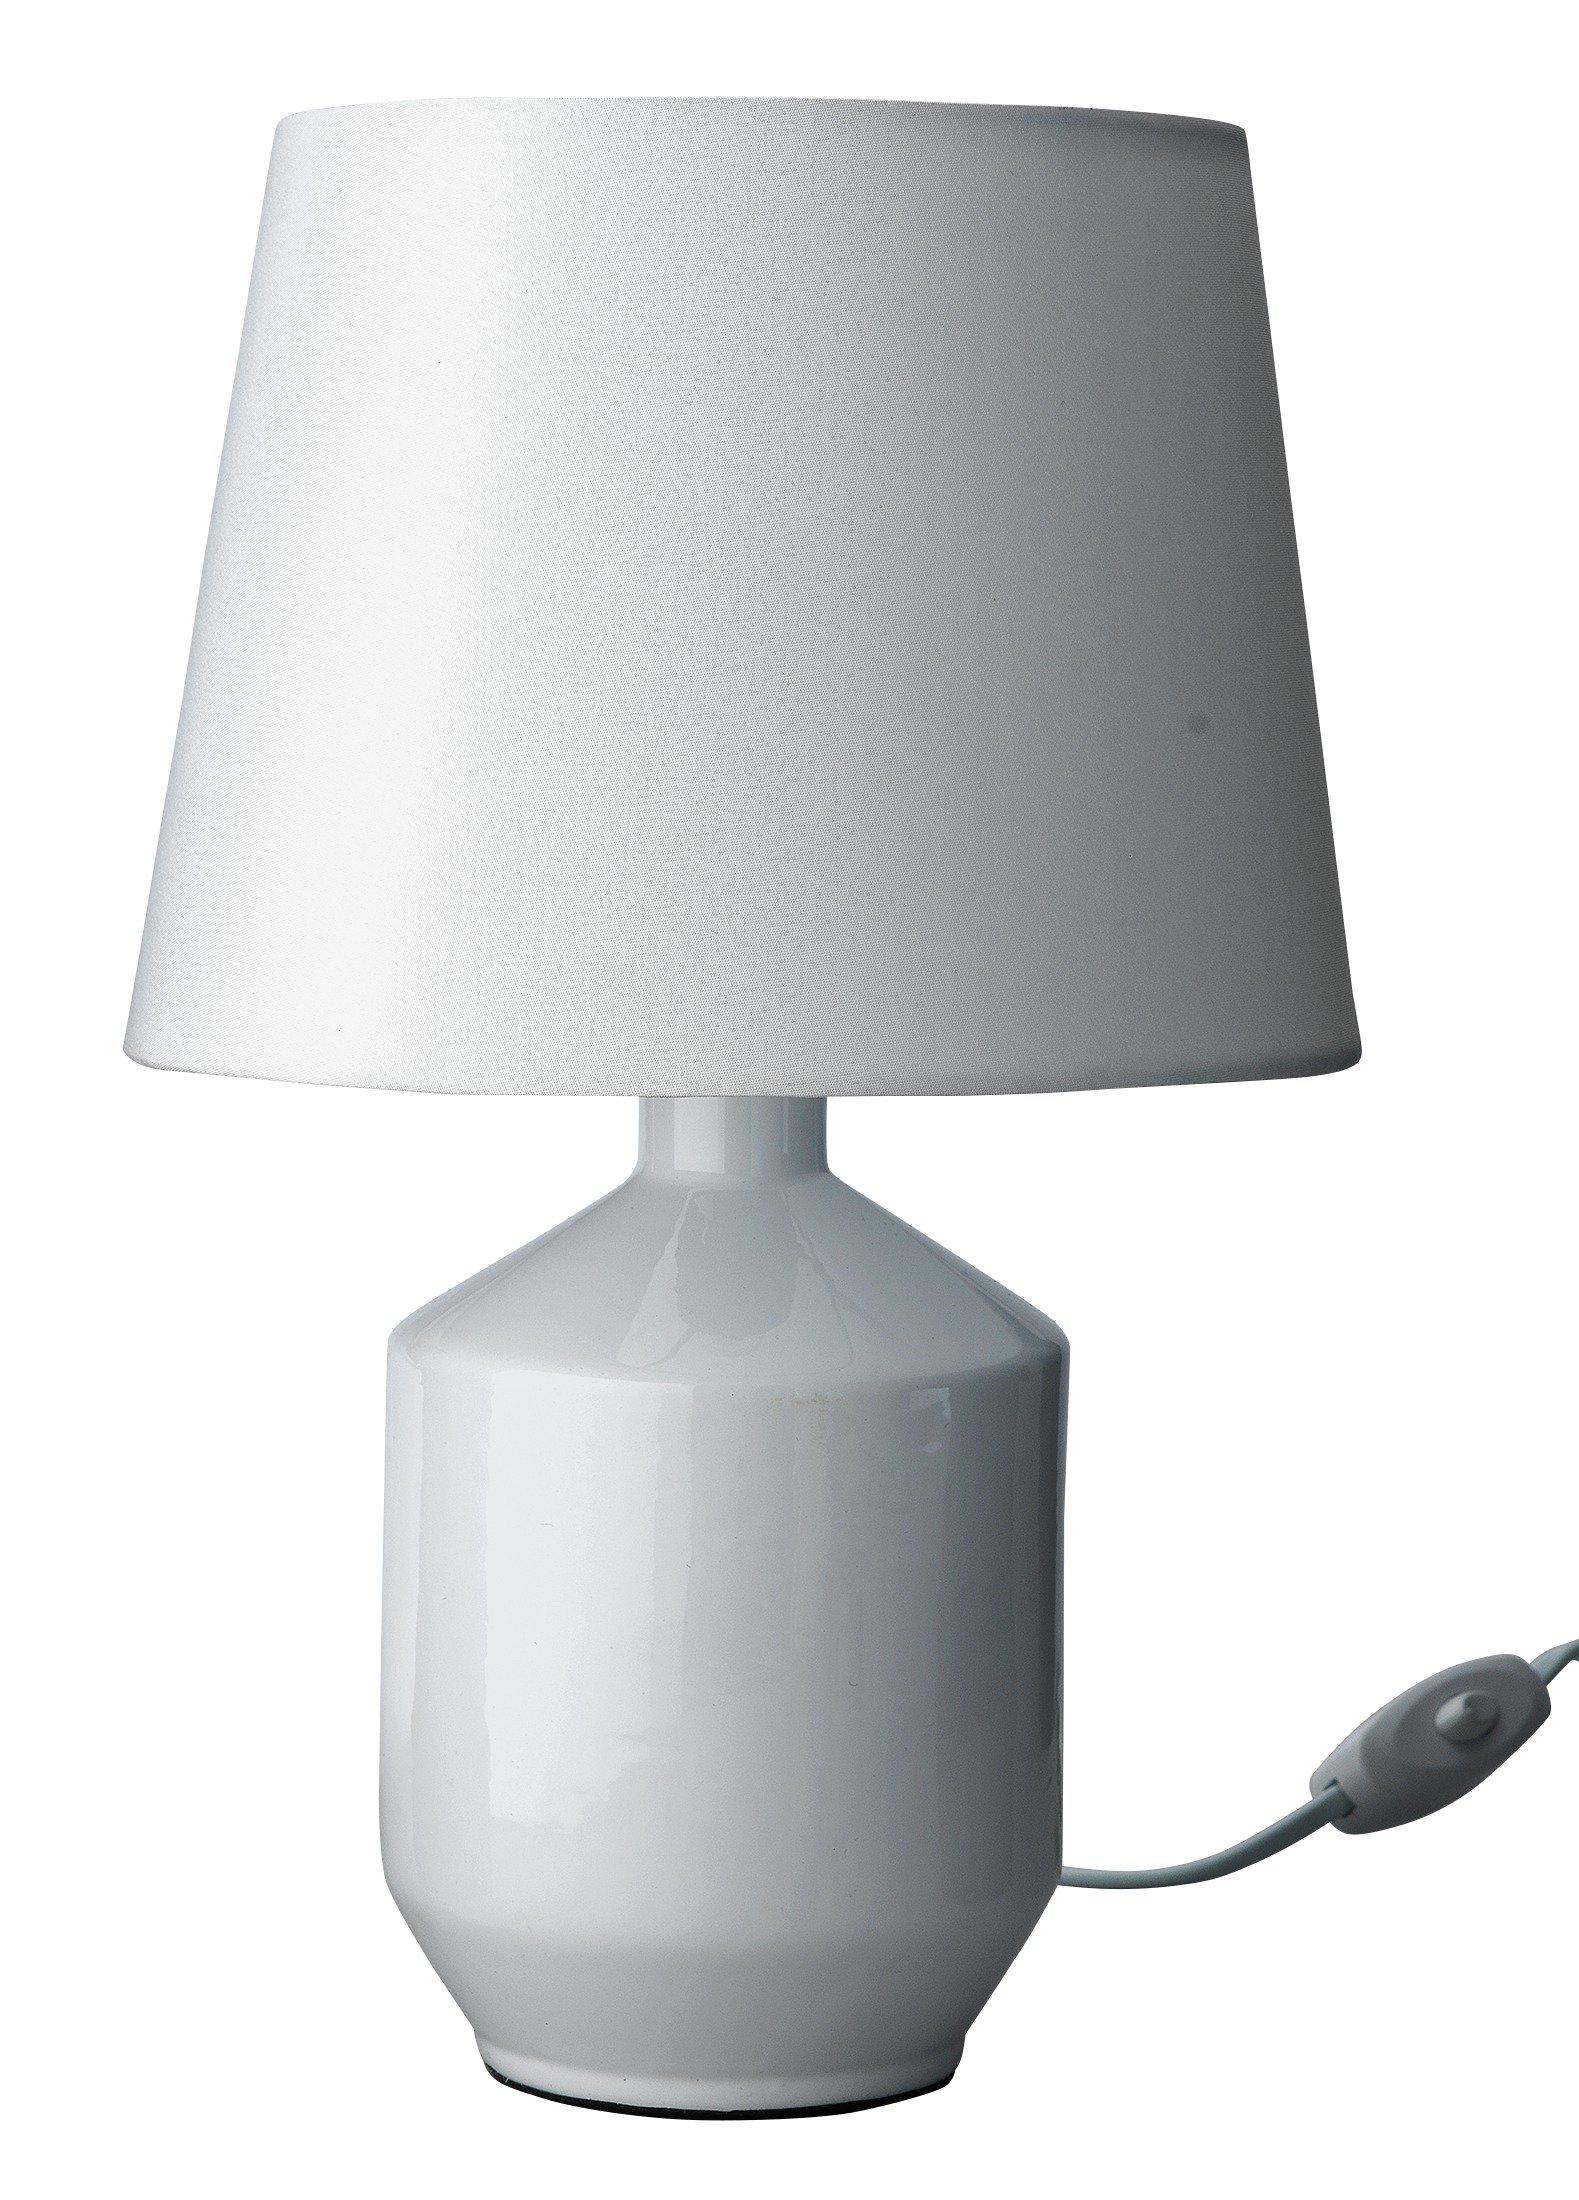 Image of ColourMatch Ceramic Table Lamp - Super White